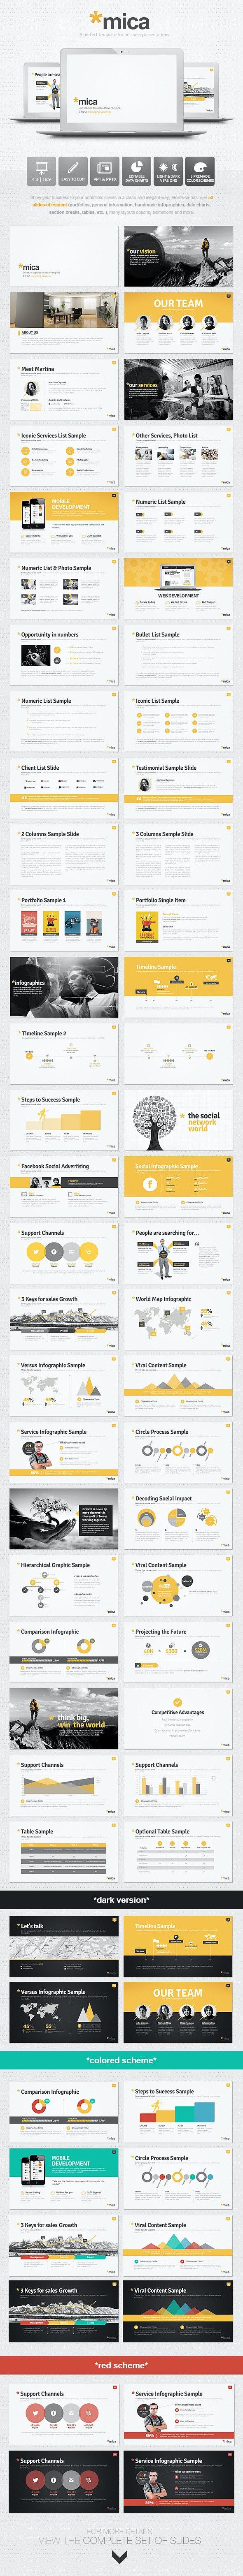 Mica Powerpoint Presentation Template - PowerPoint Templates Presentation Templates